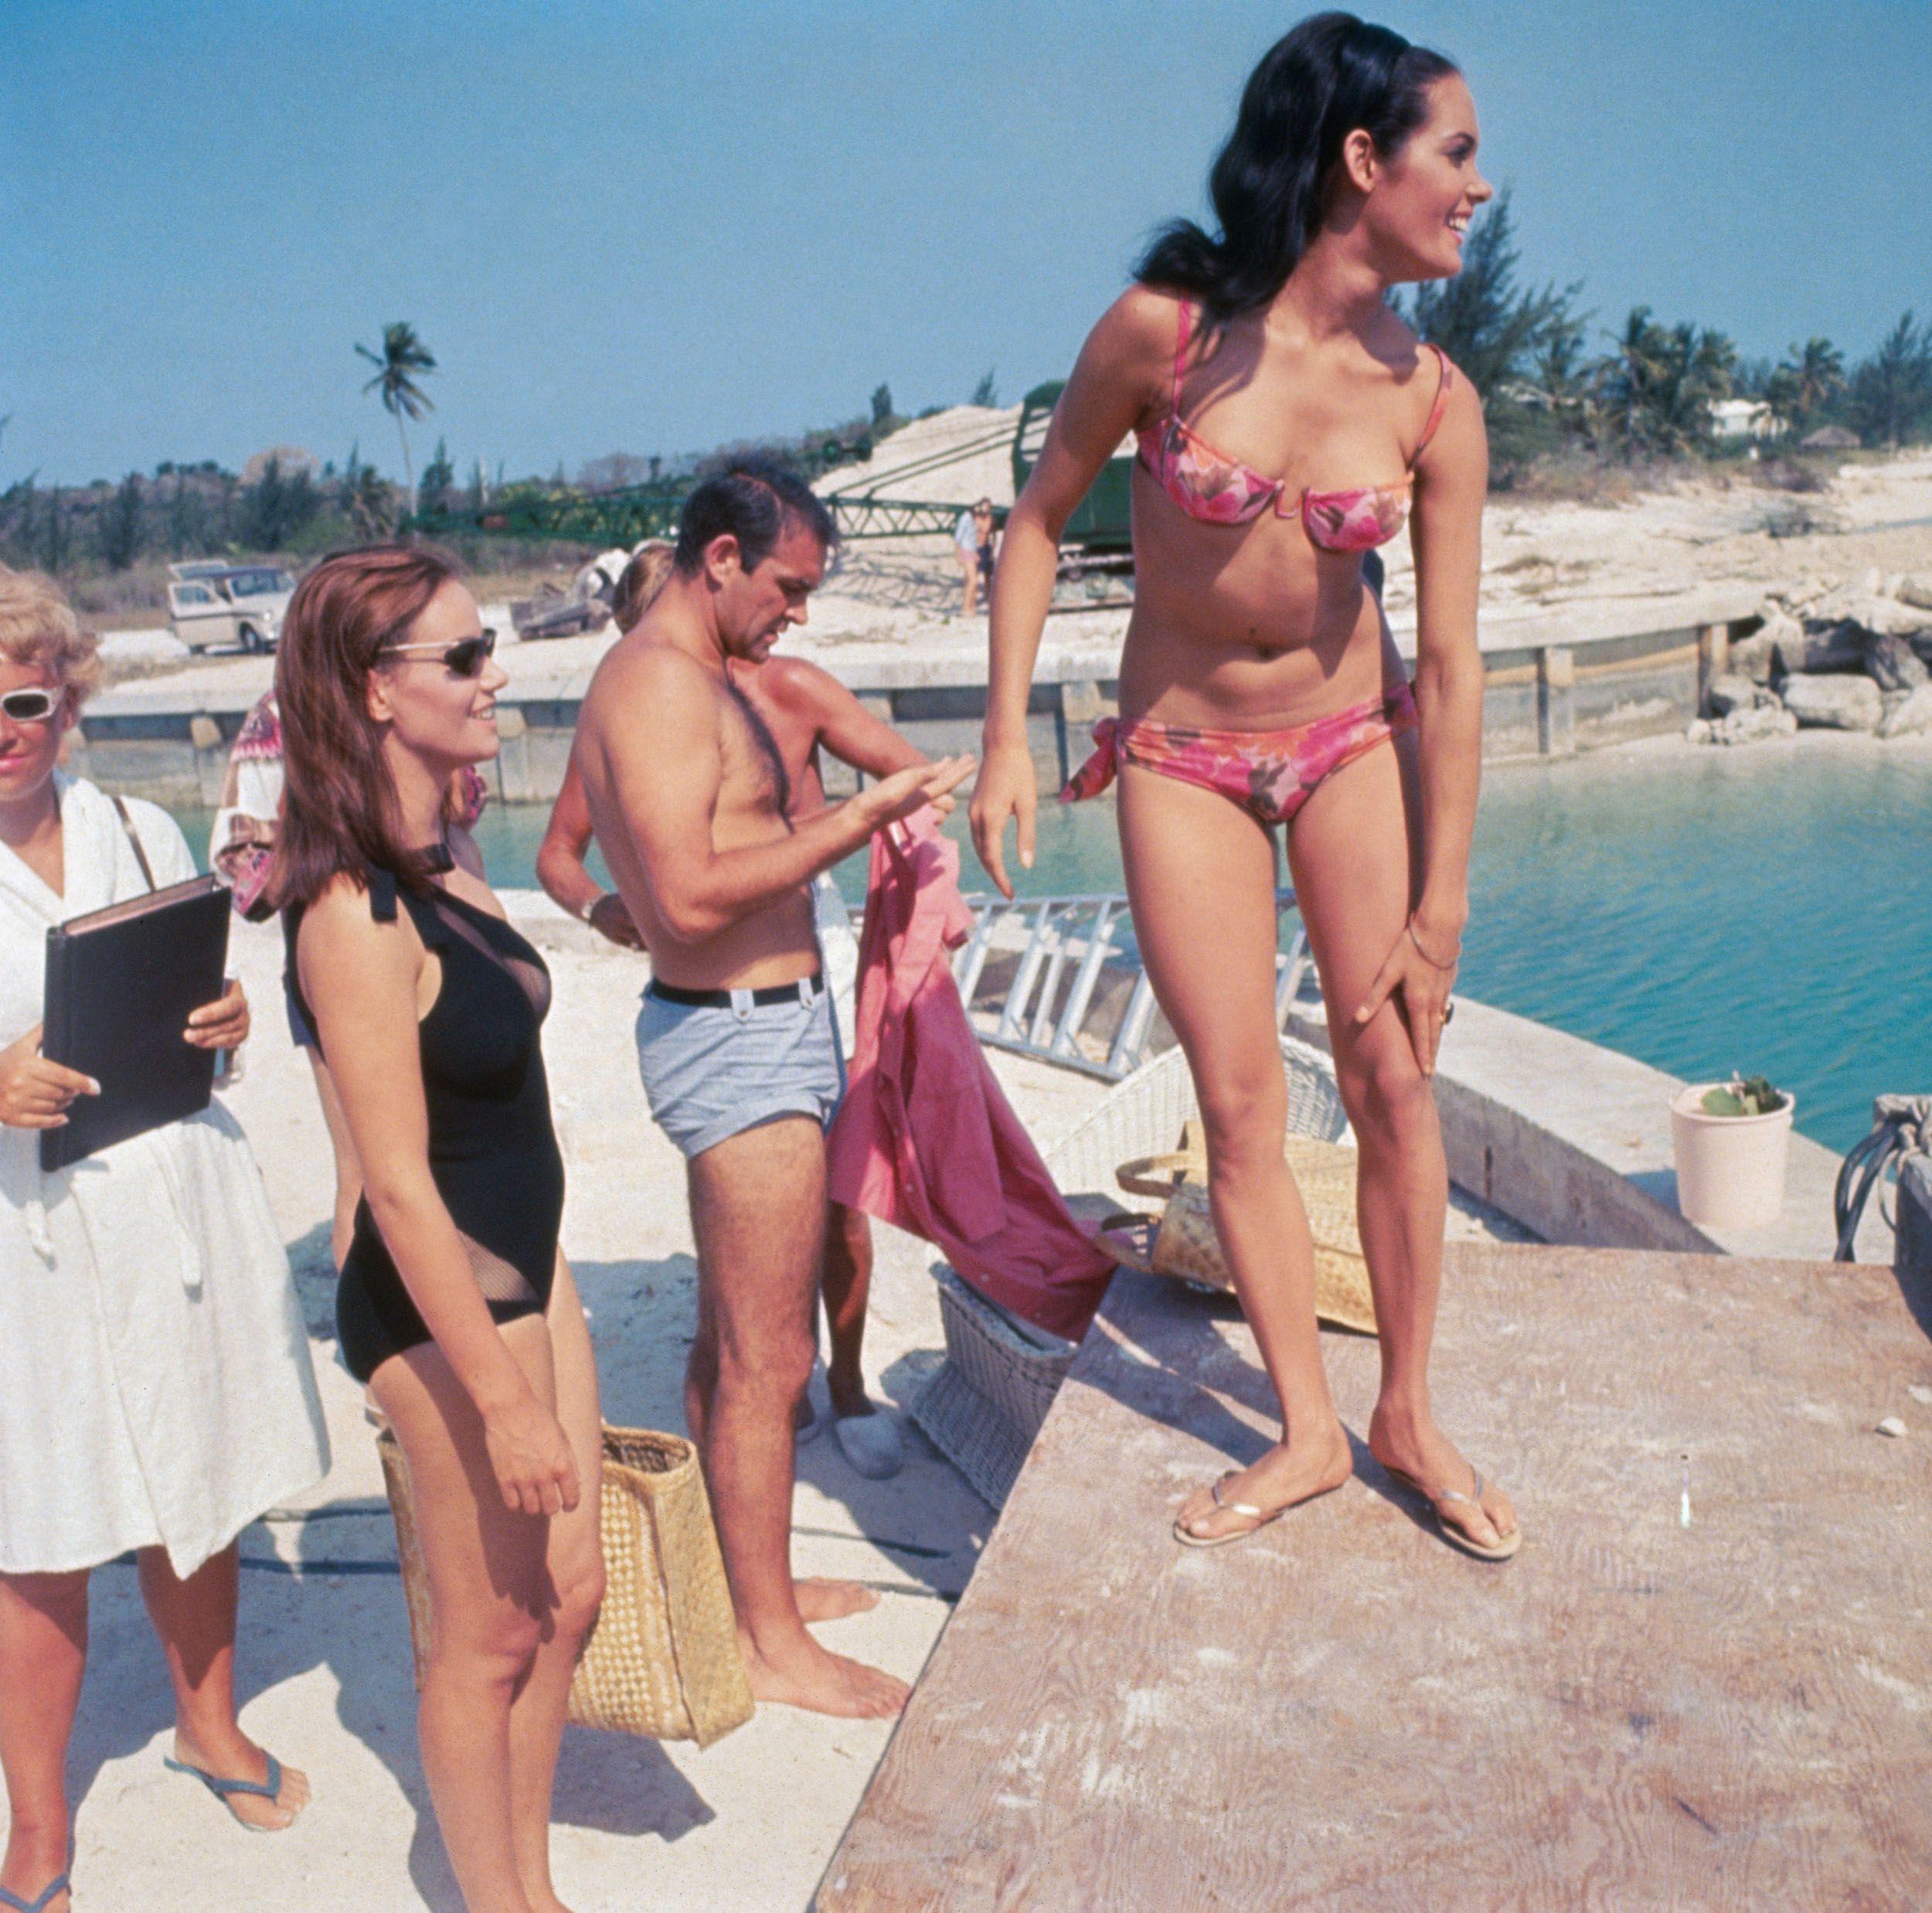 Bikini Royale Trailer james bond set photos - behind-the-scenes james bond photos